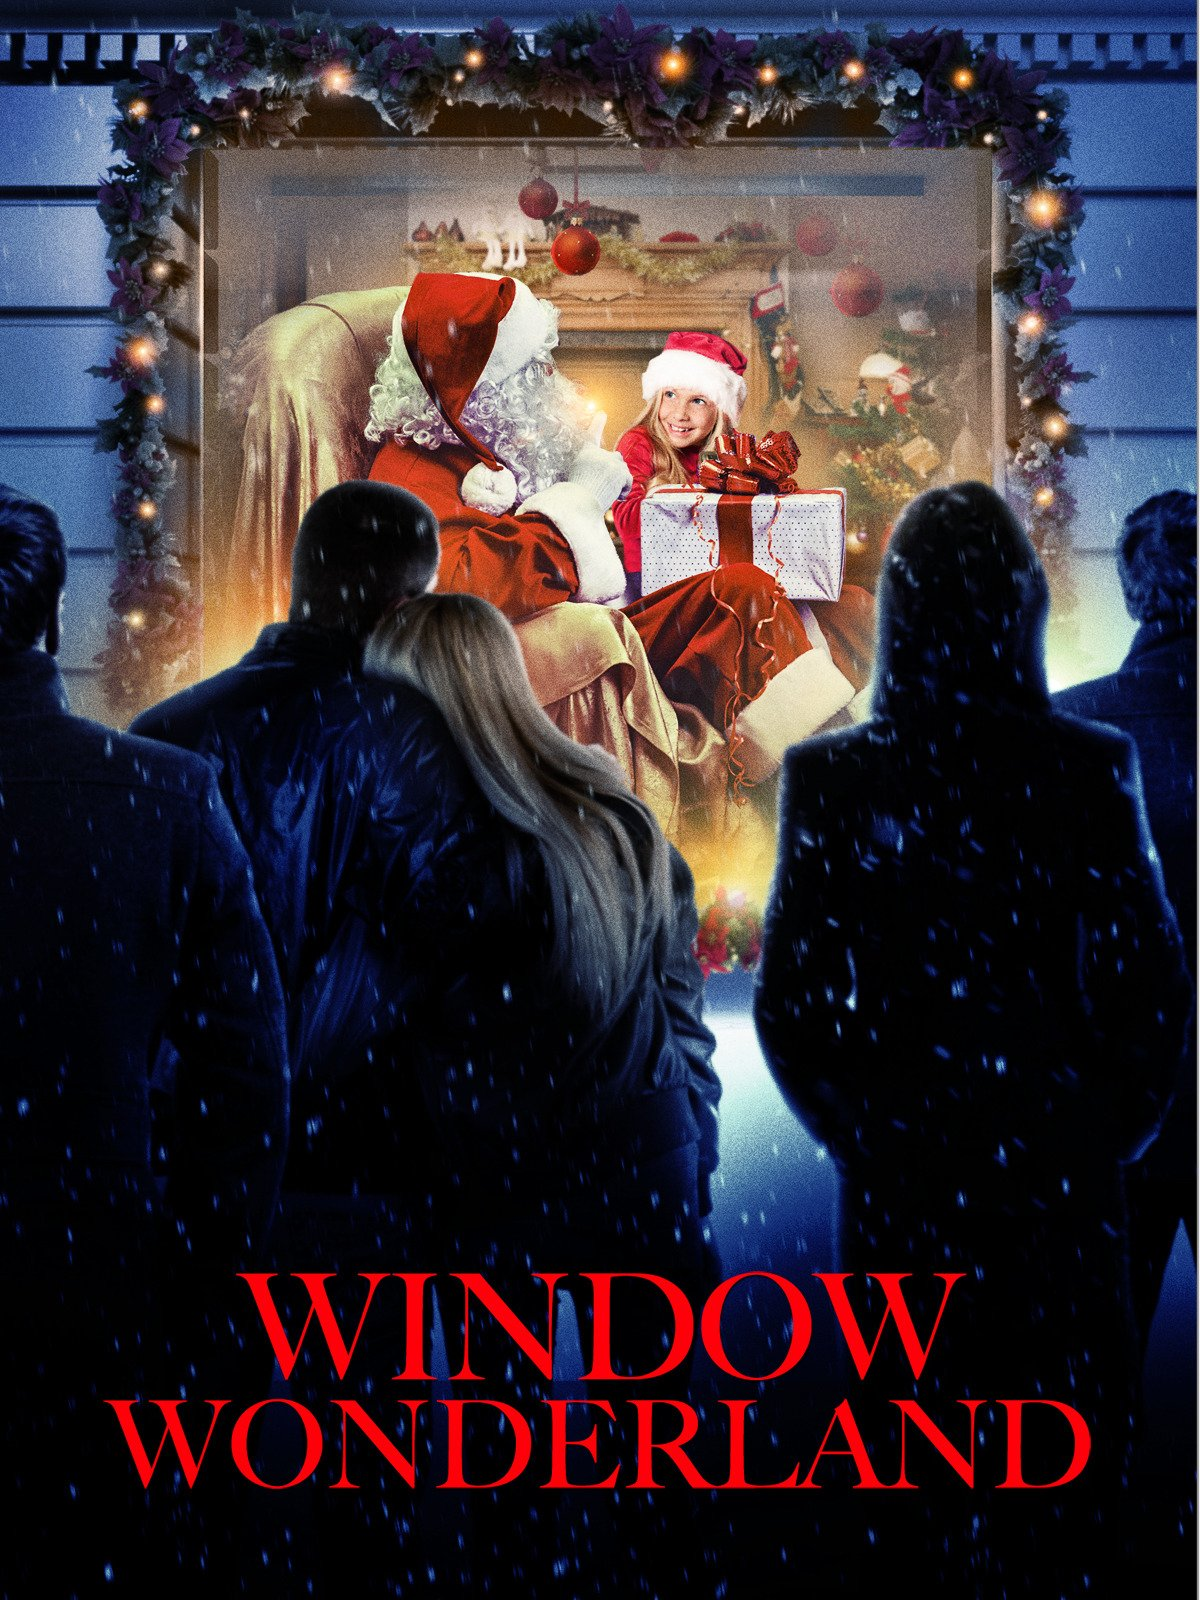 Amazon.co.uk: Watch Window Wonderland   Prime Video